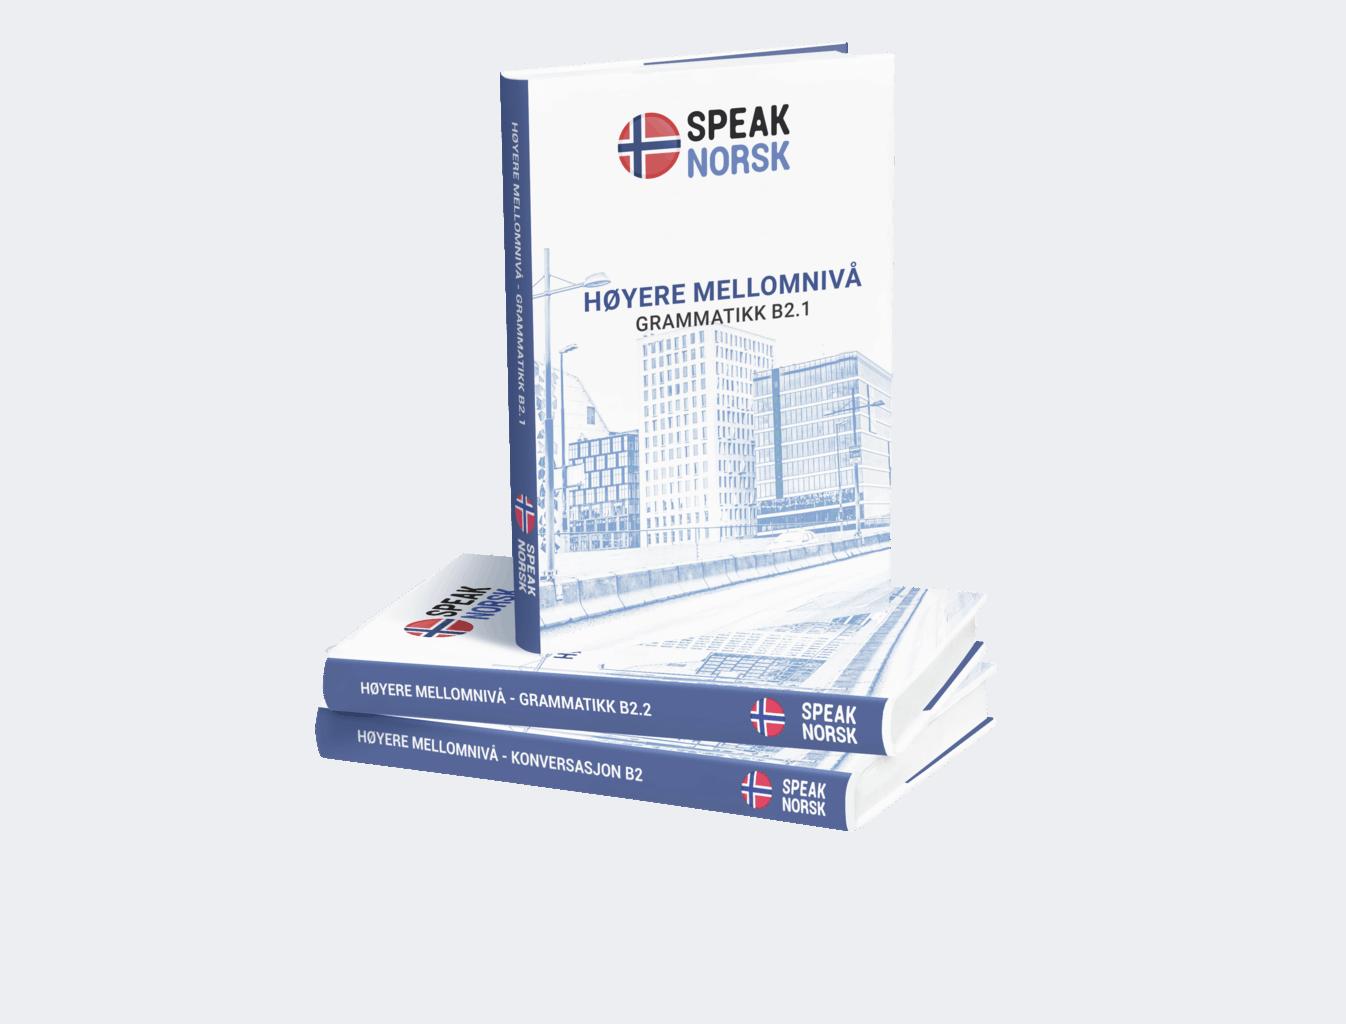 SpeakNorsk_booksB1_pile_flat fixed gram b2